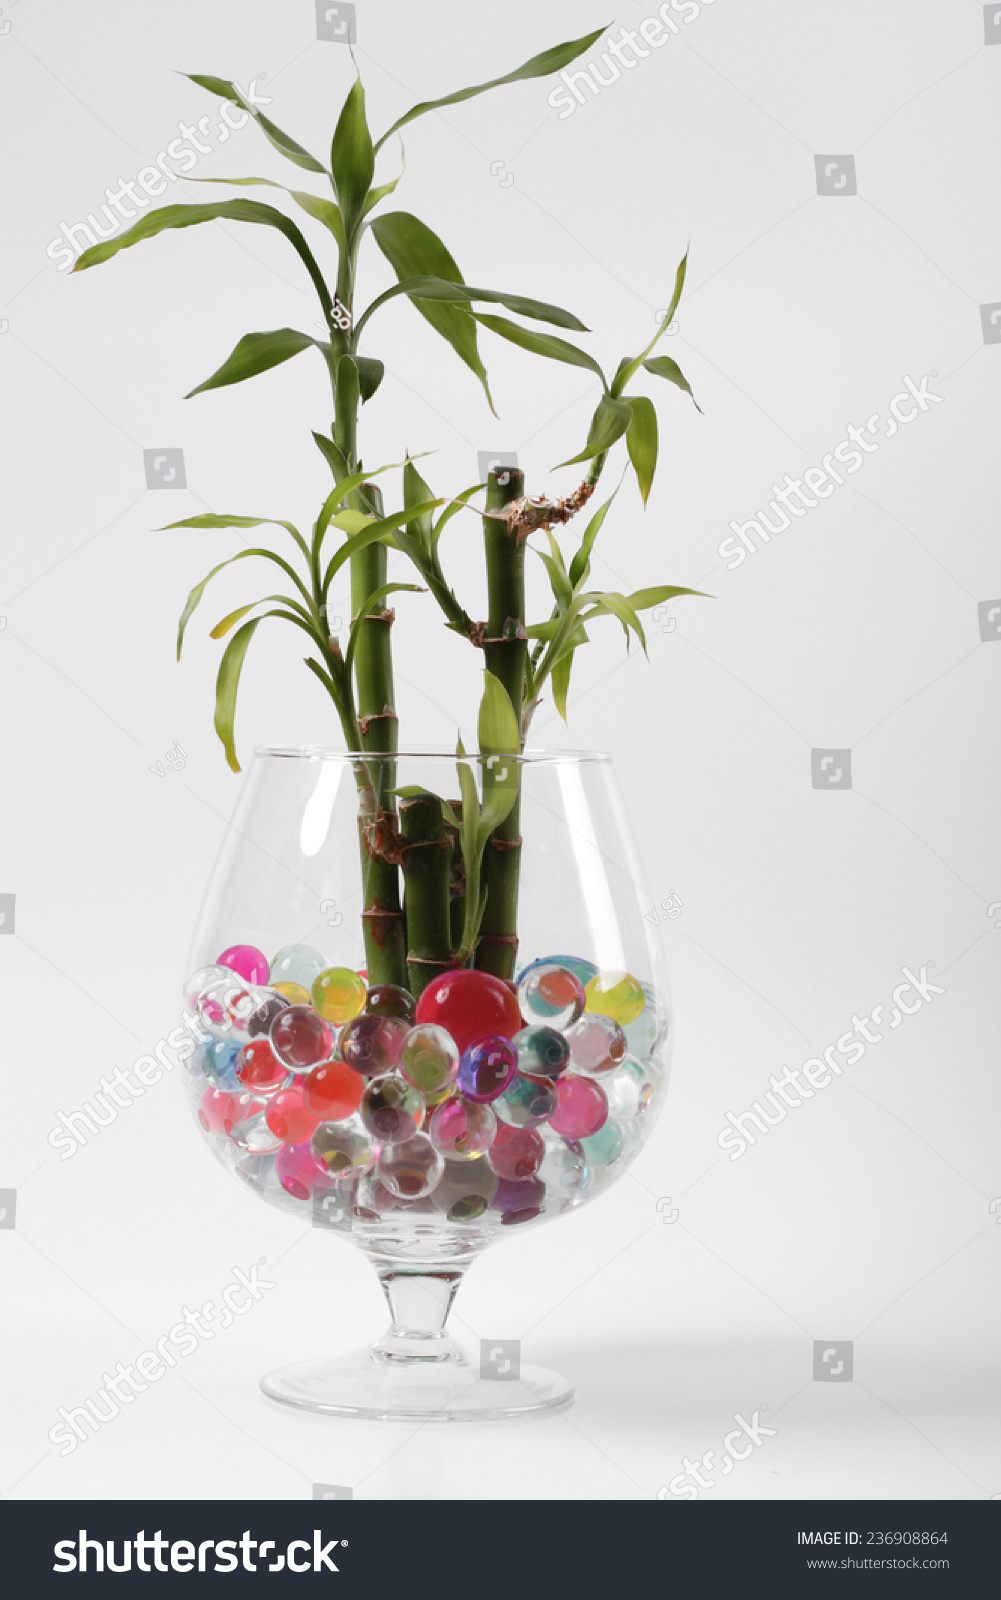 Beautiful flowers vases hydrogel stock photo edit now 236908864 beautiful flowers in vases with hydrogel izmirmasajfo